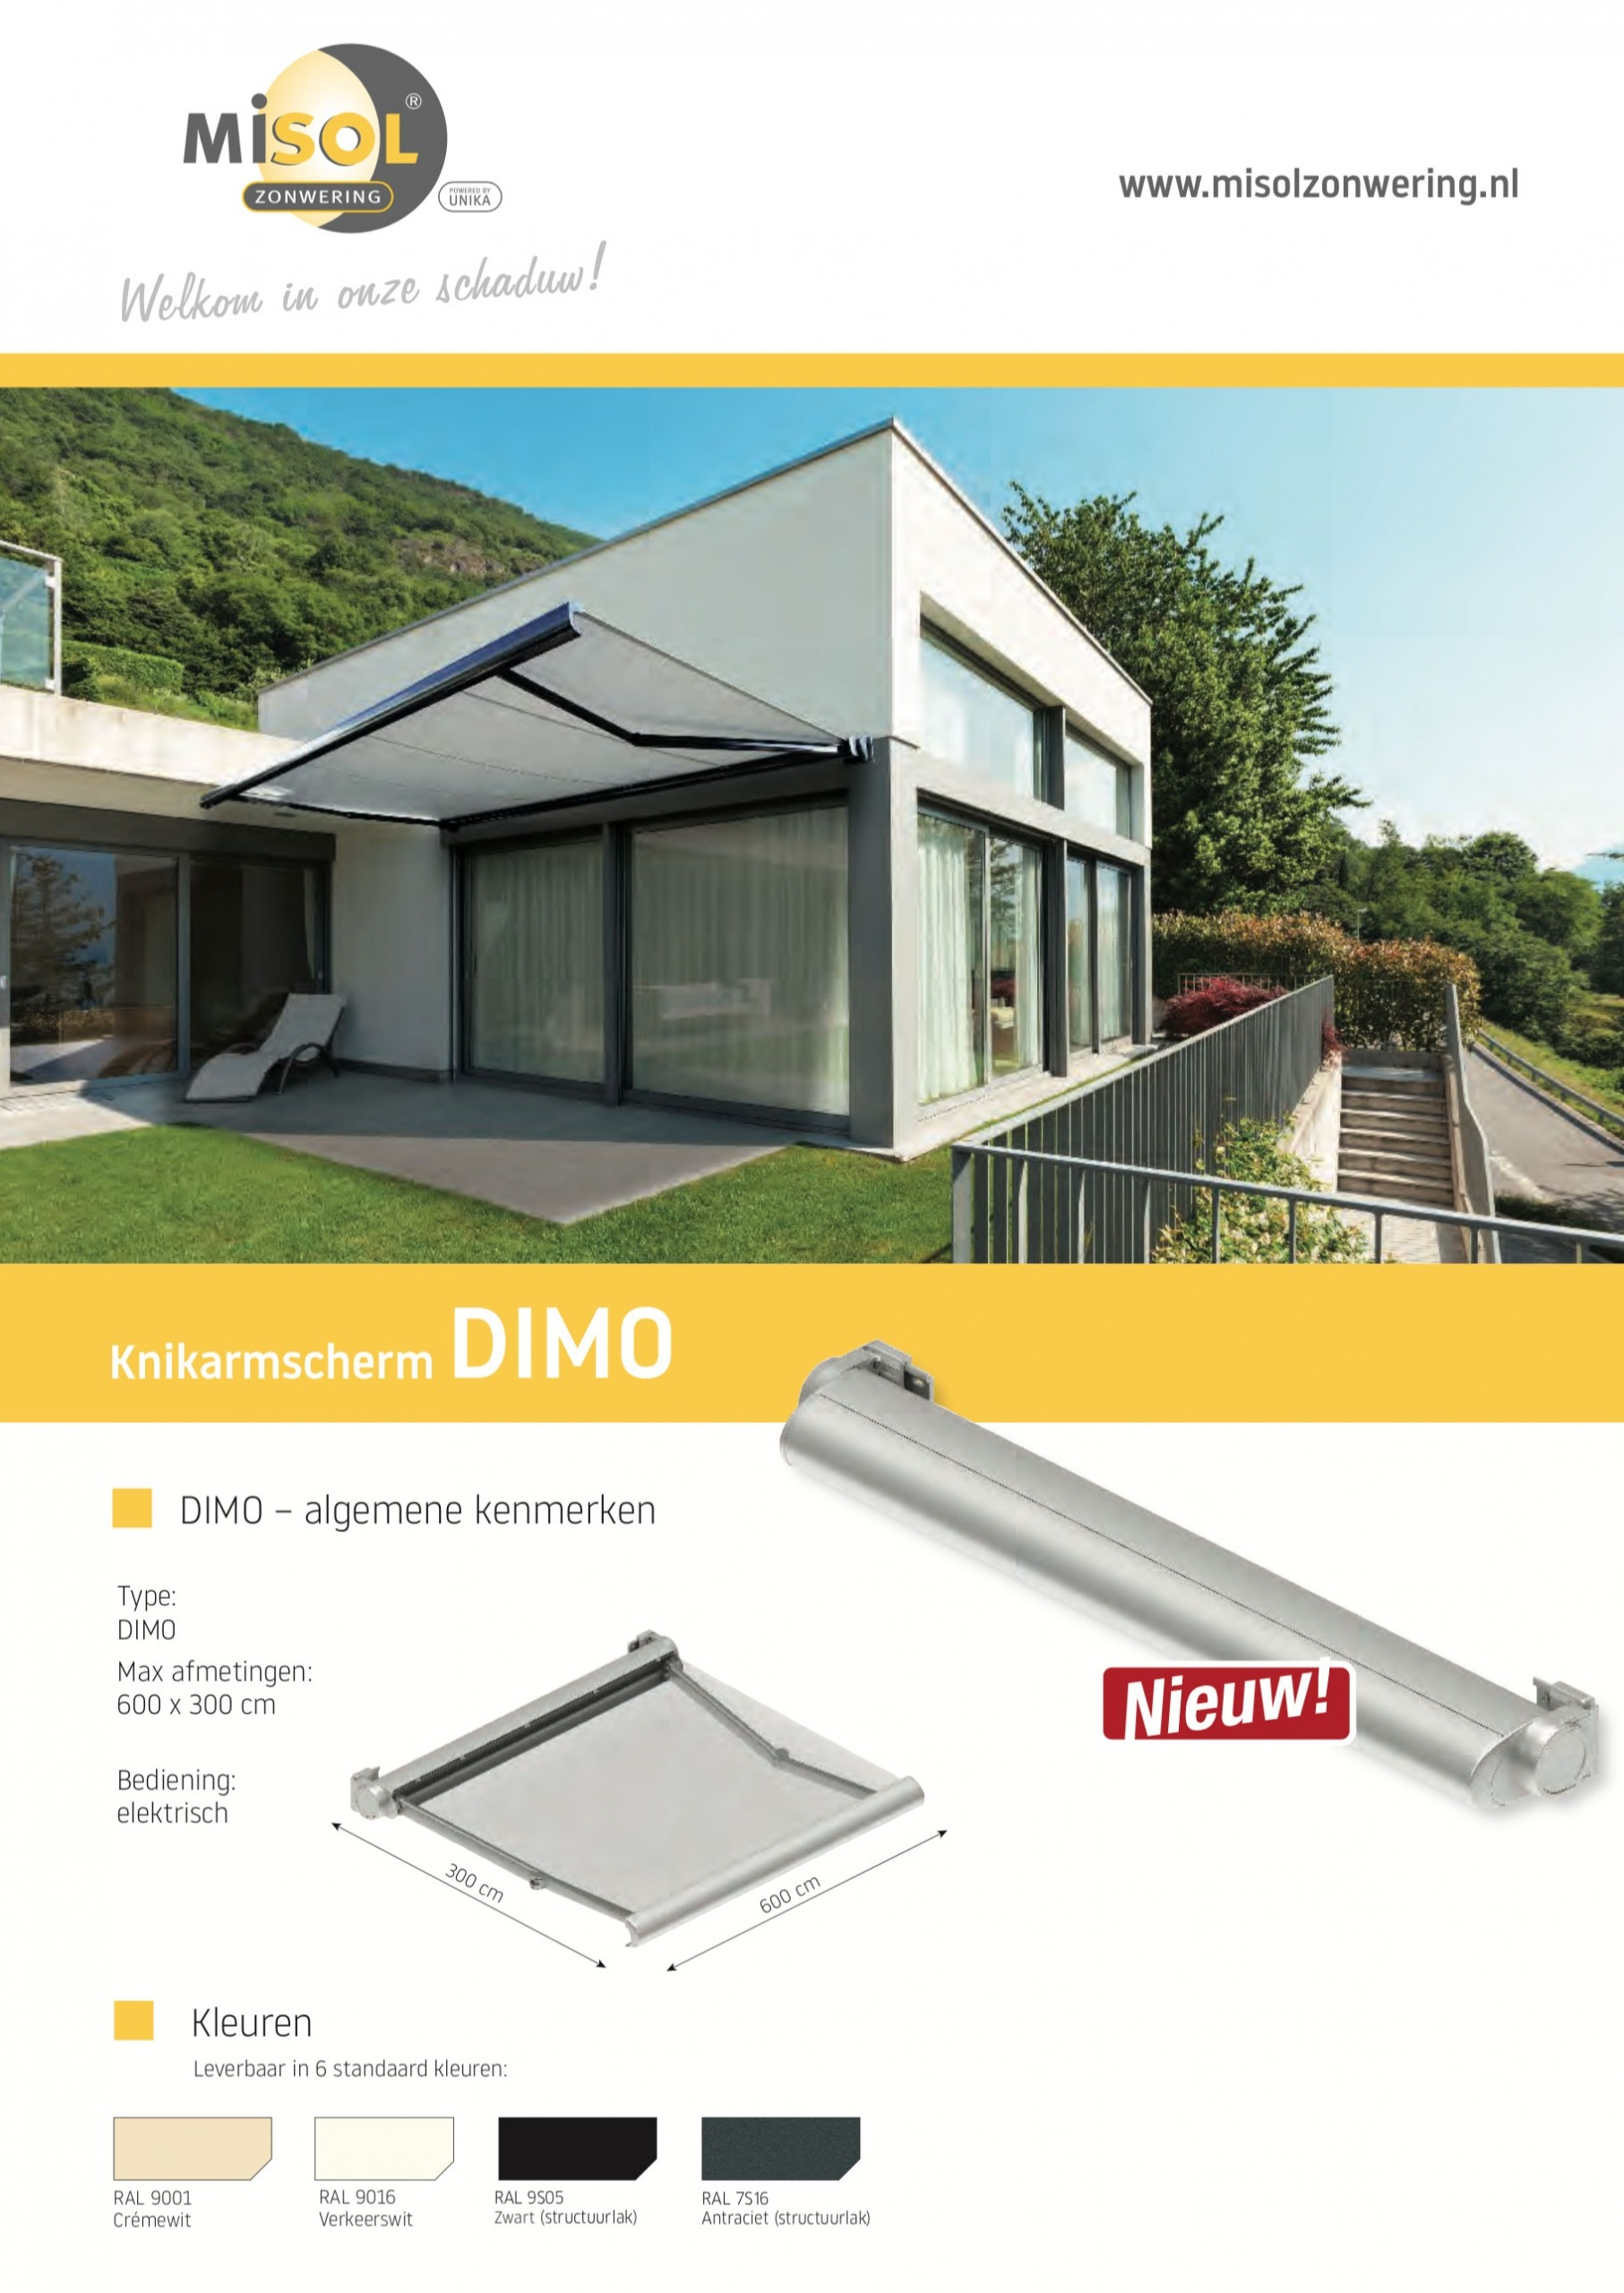 Dimo - Misol Huismerk